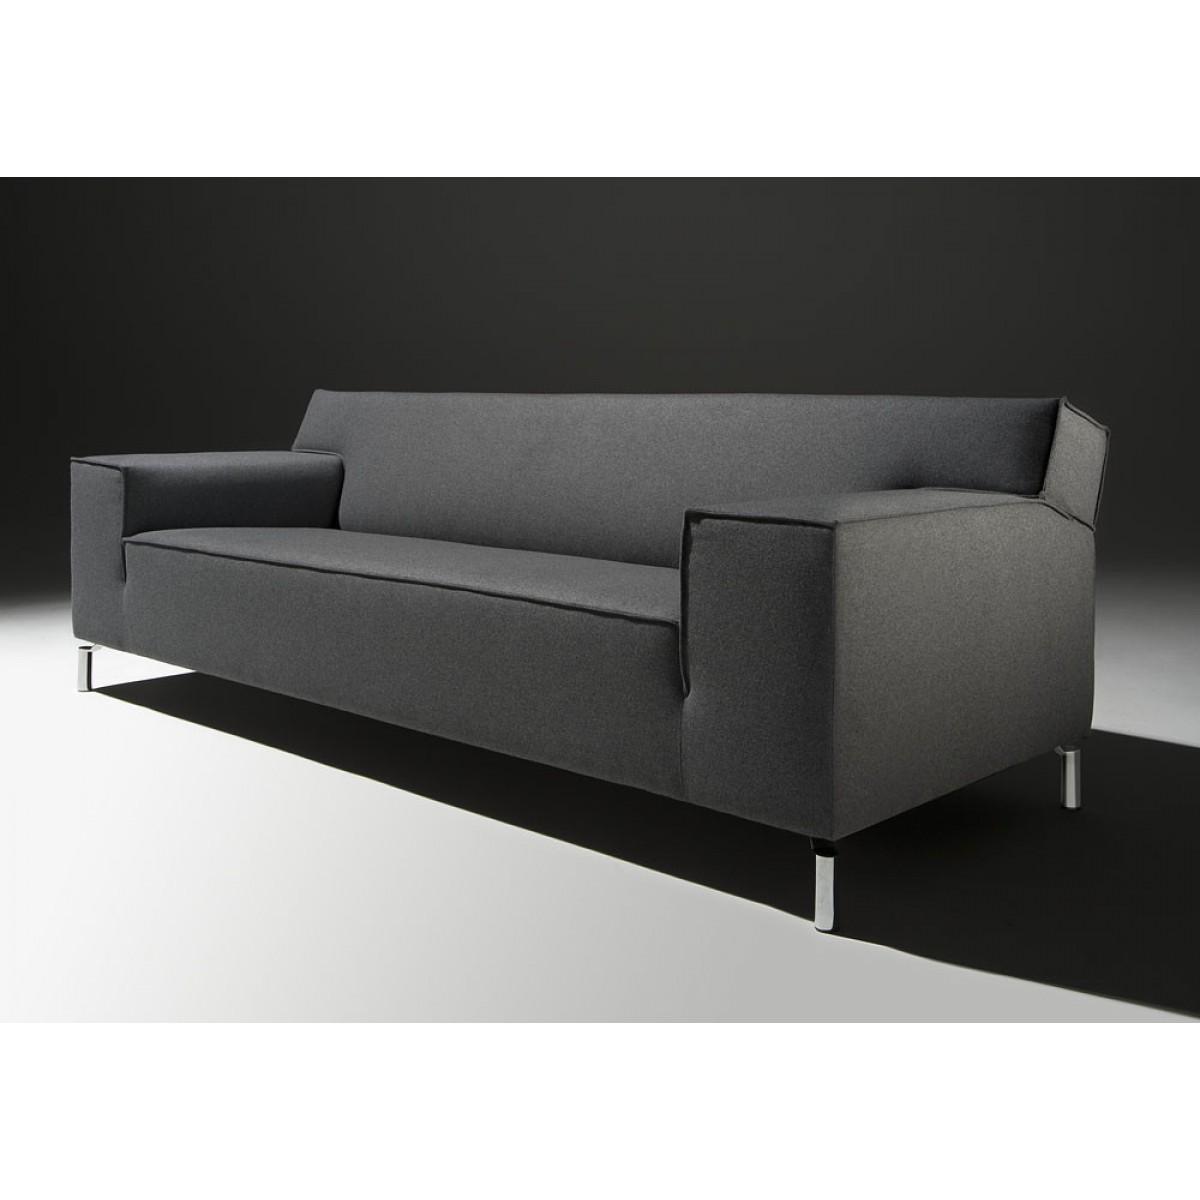 Brent Design Sofa Preisgunstig Online Kaufen I Live Design